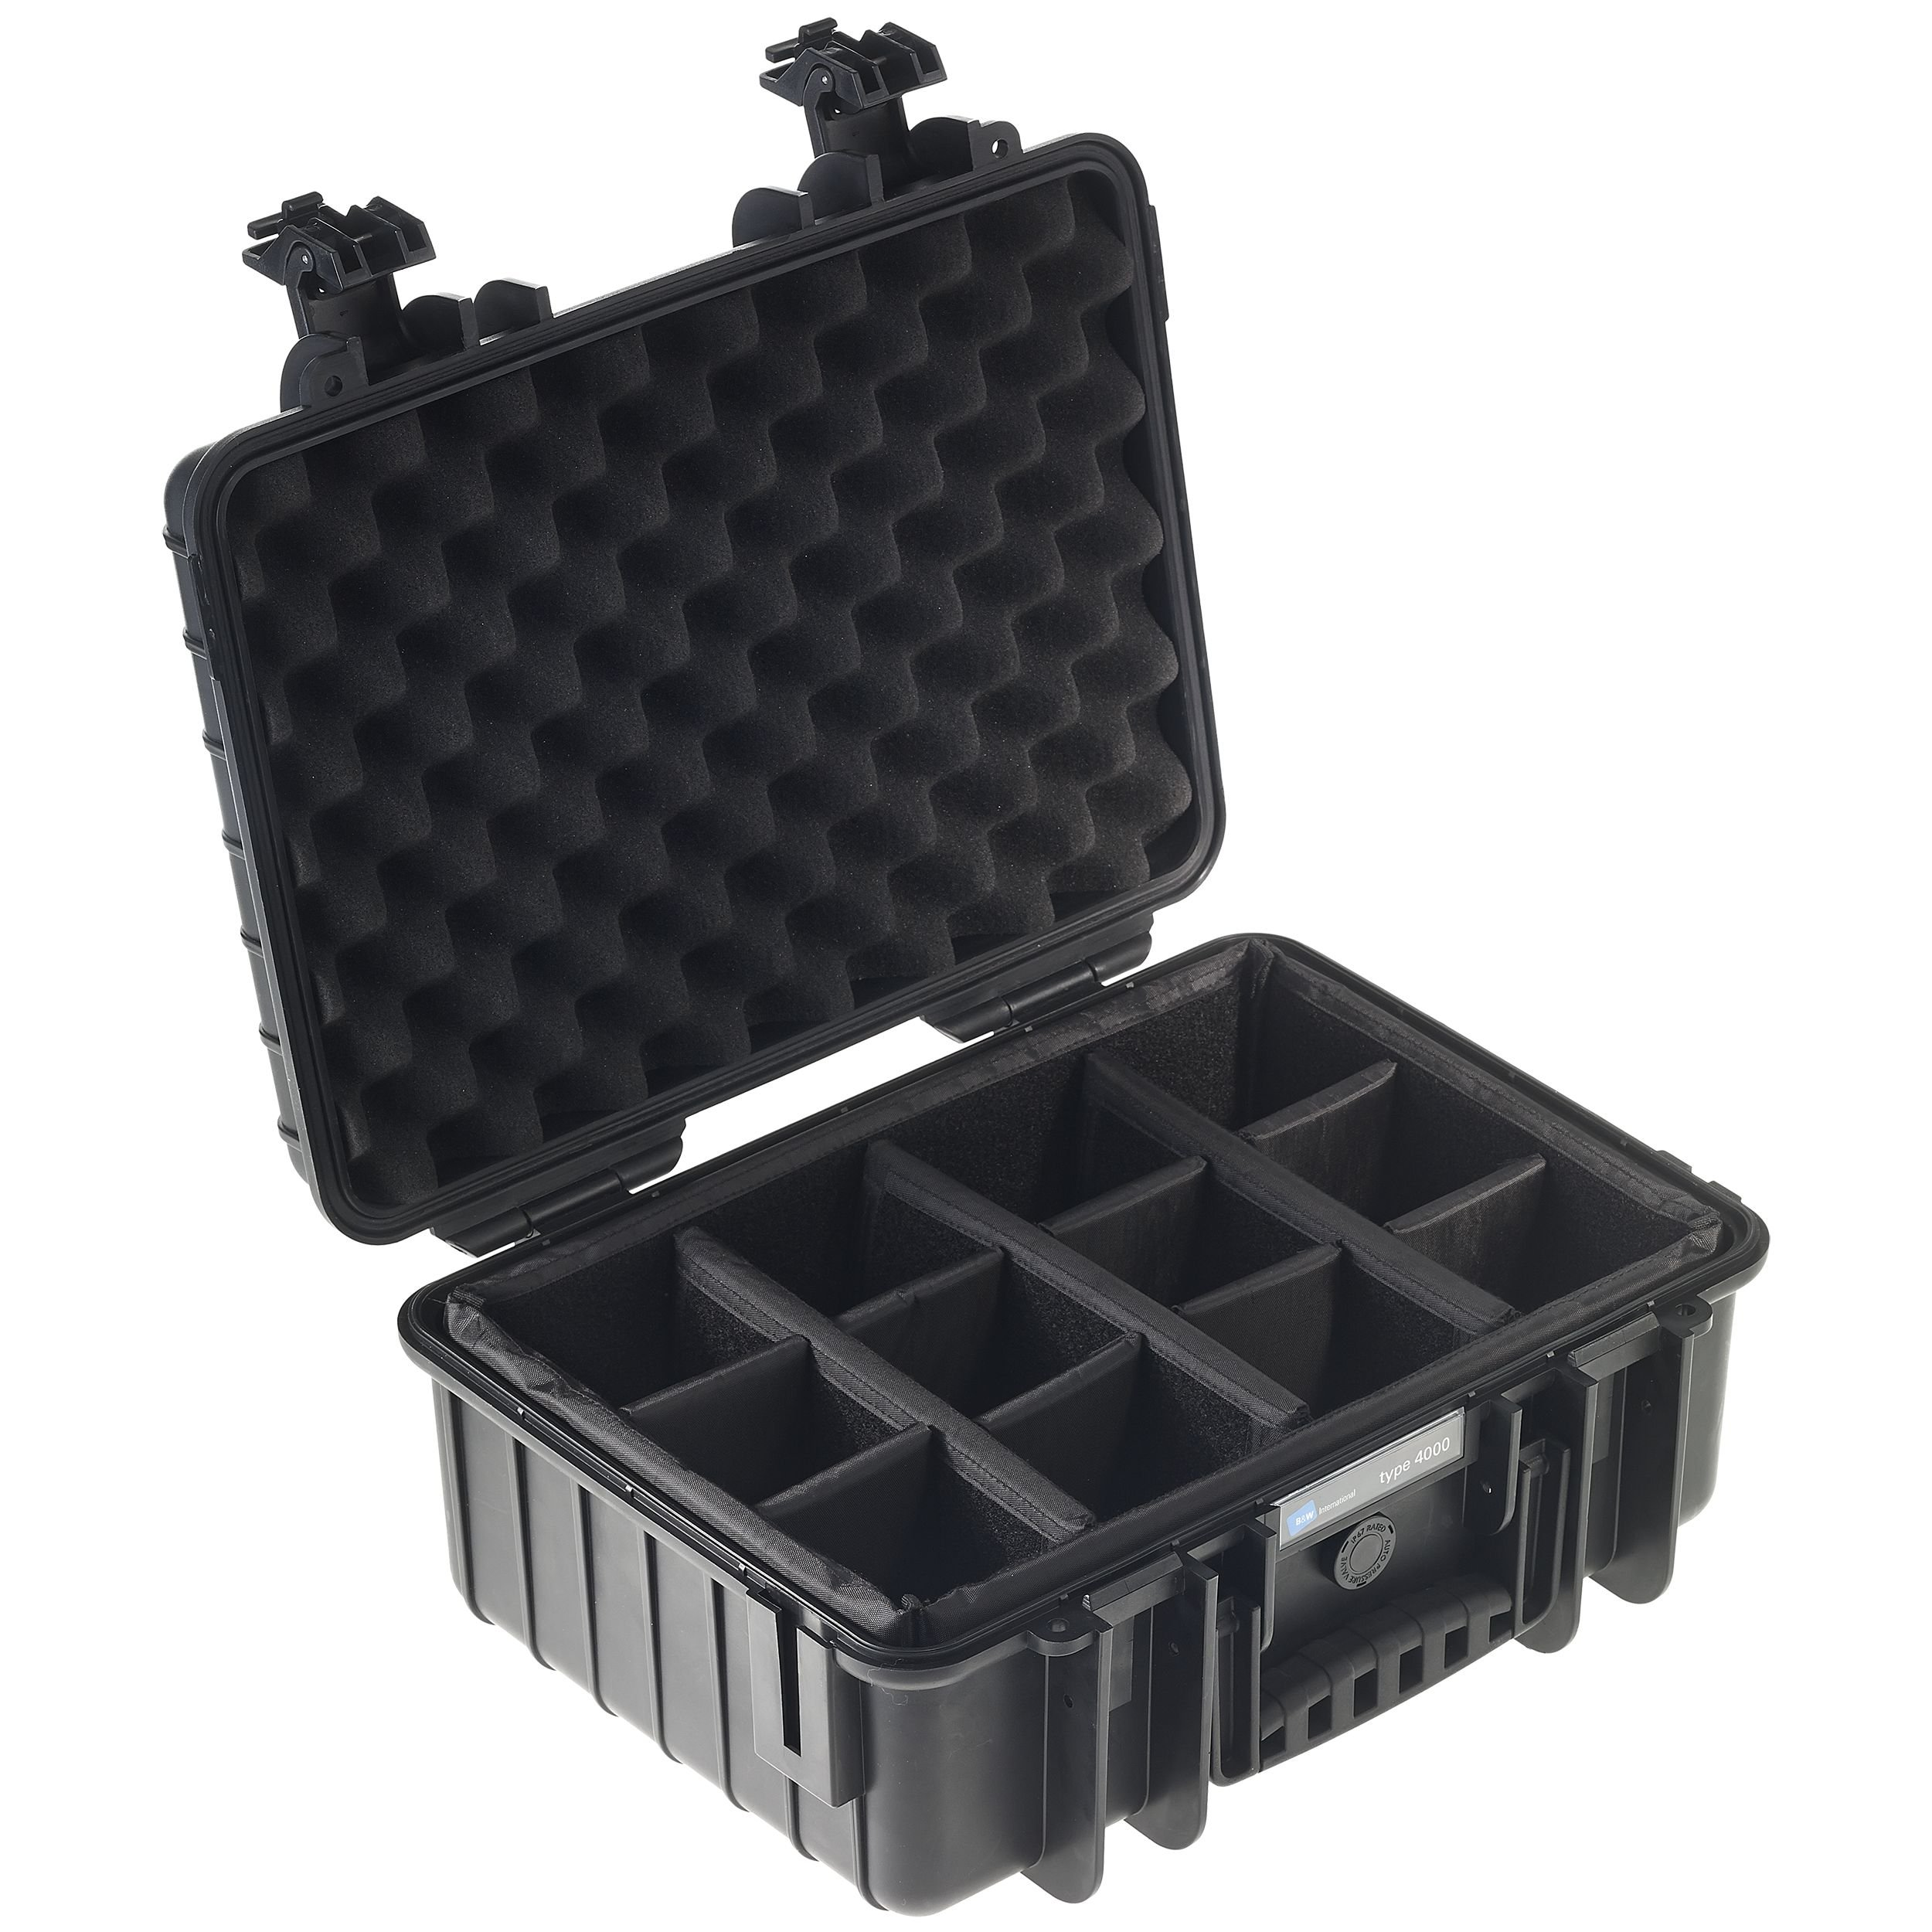 B&W International 4000/B/RPD 4000 Outdoor Case with RPD Insert Durable Type, Black